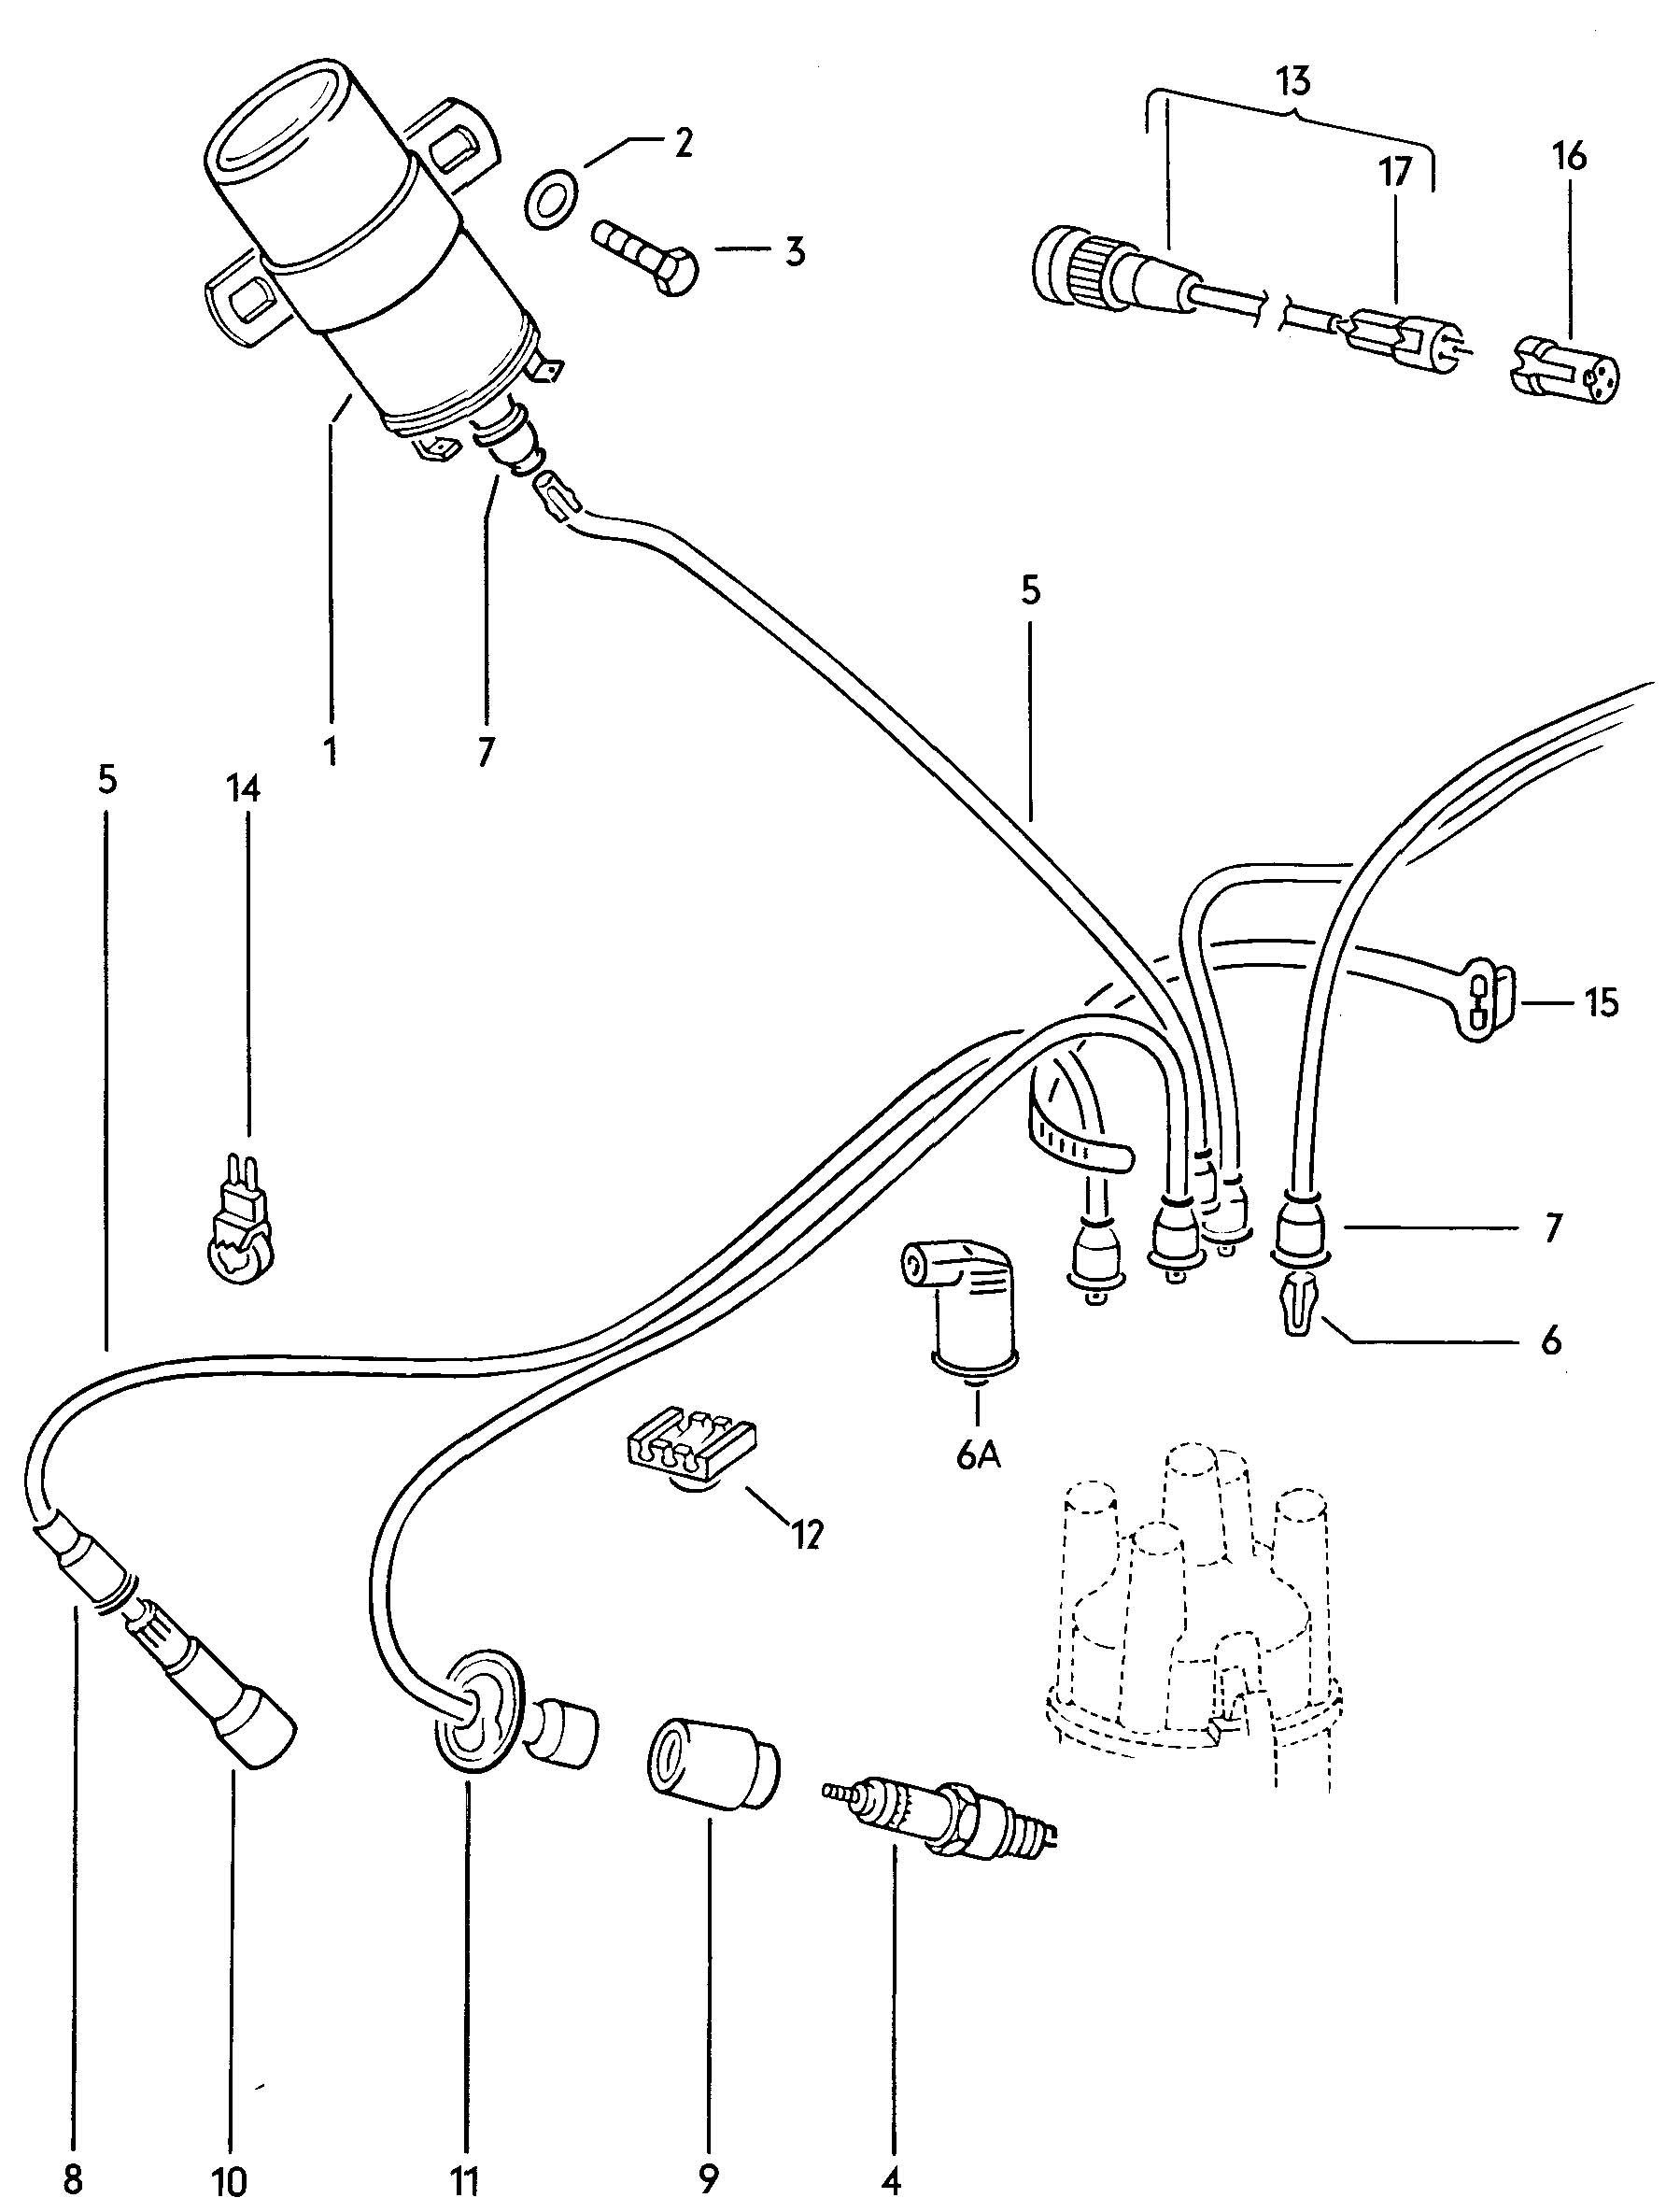 leviton 5641 double switch wiring diagram 072e48 1960 vw bus wiring diagram wiring library  072e48 1960 vw bus wiring diagram